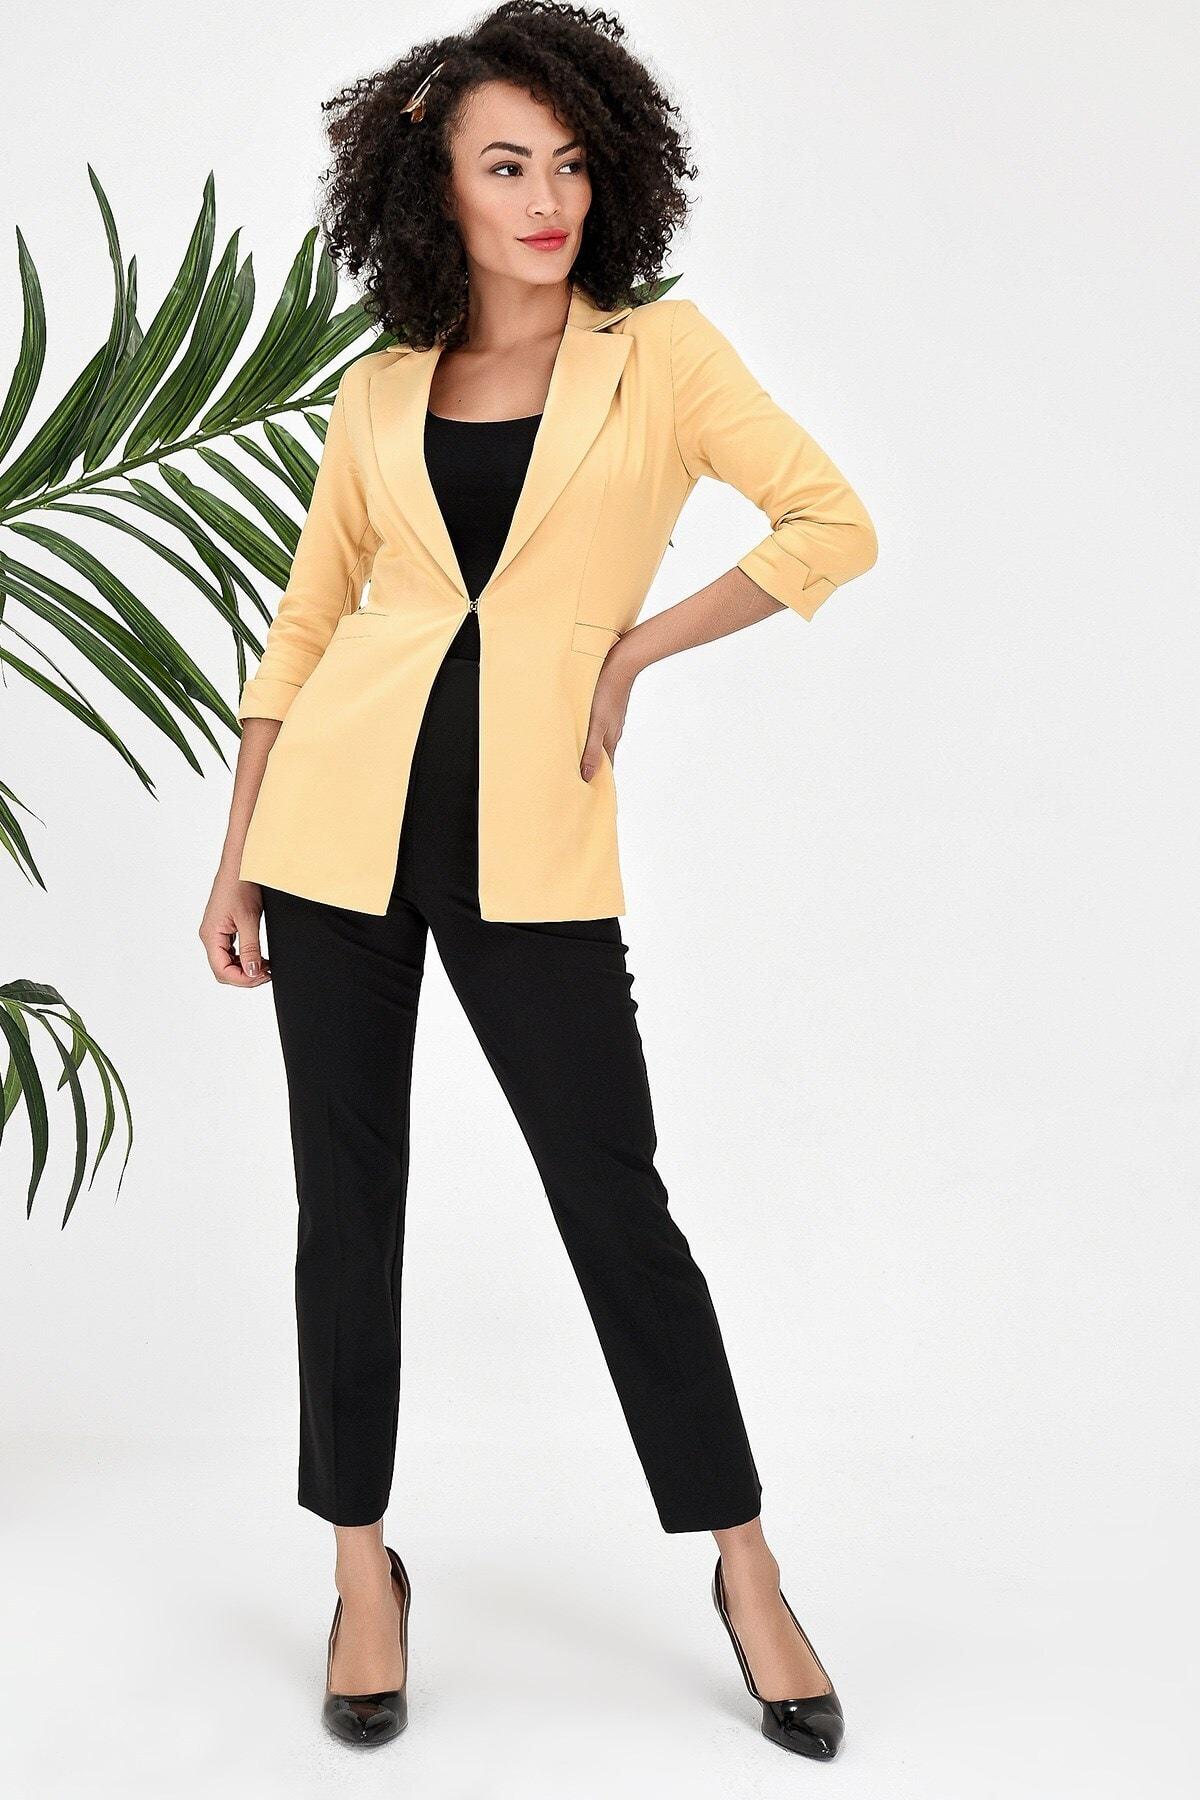 Kapri Truvakar Kol Süs Cepli Kopçalı Ofis Blazer Kumaş Ceket-sarı